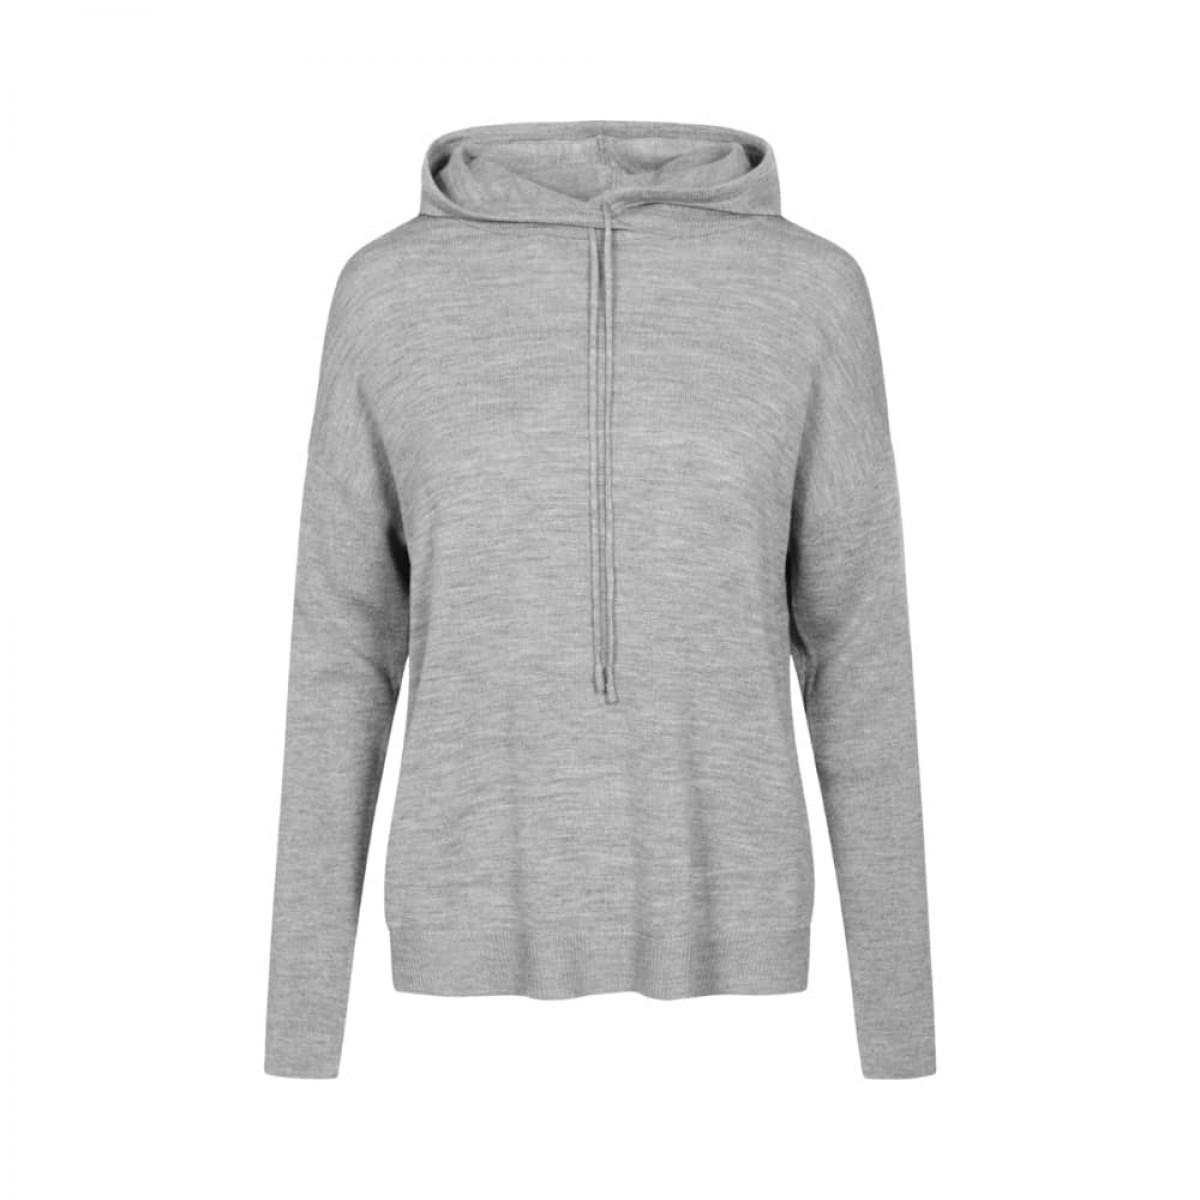 jenna merino hoodie - grey melange